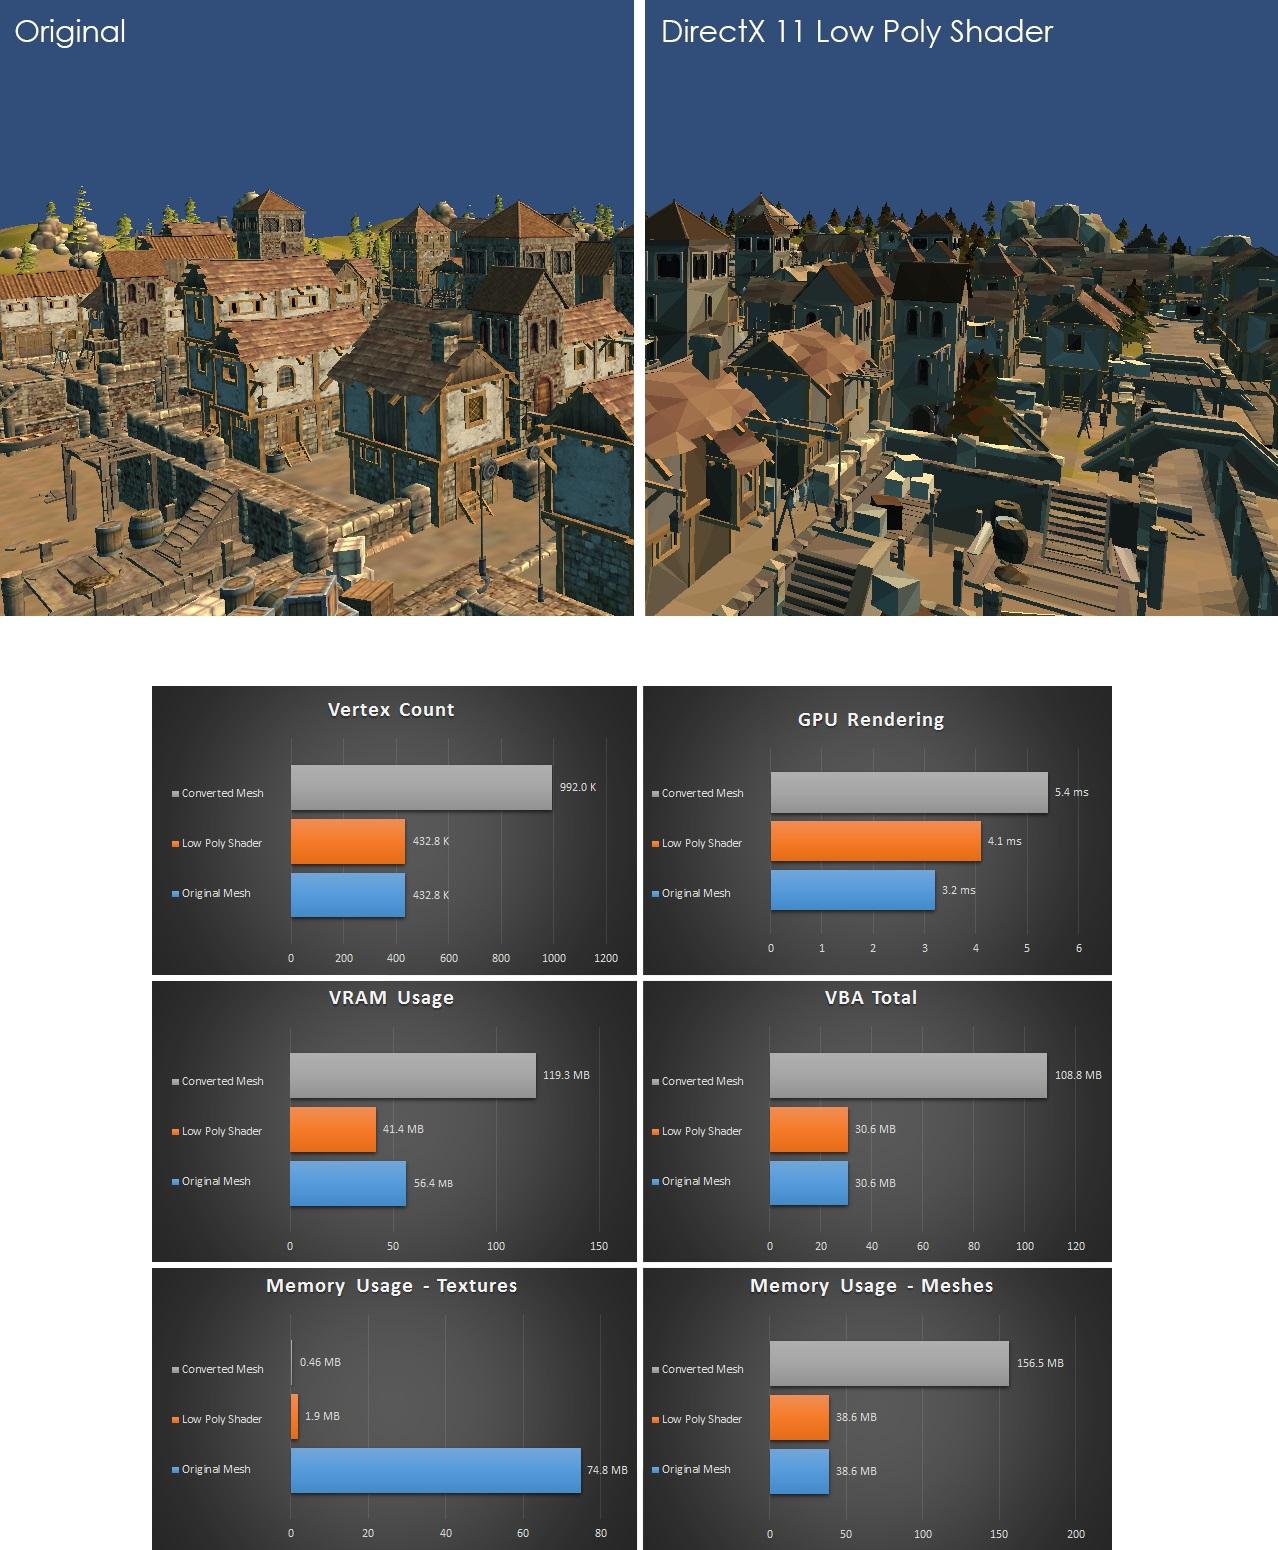 DirectX11-low-poly-shader-banchmark(full).jpg